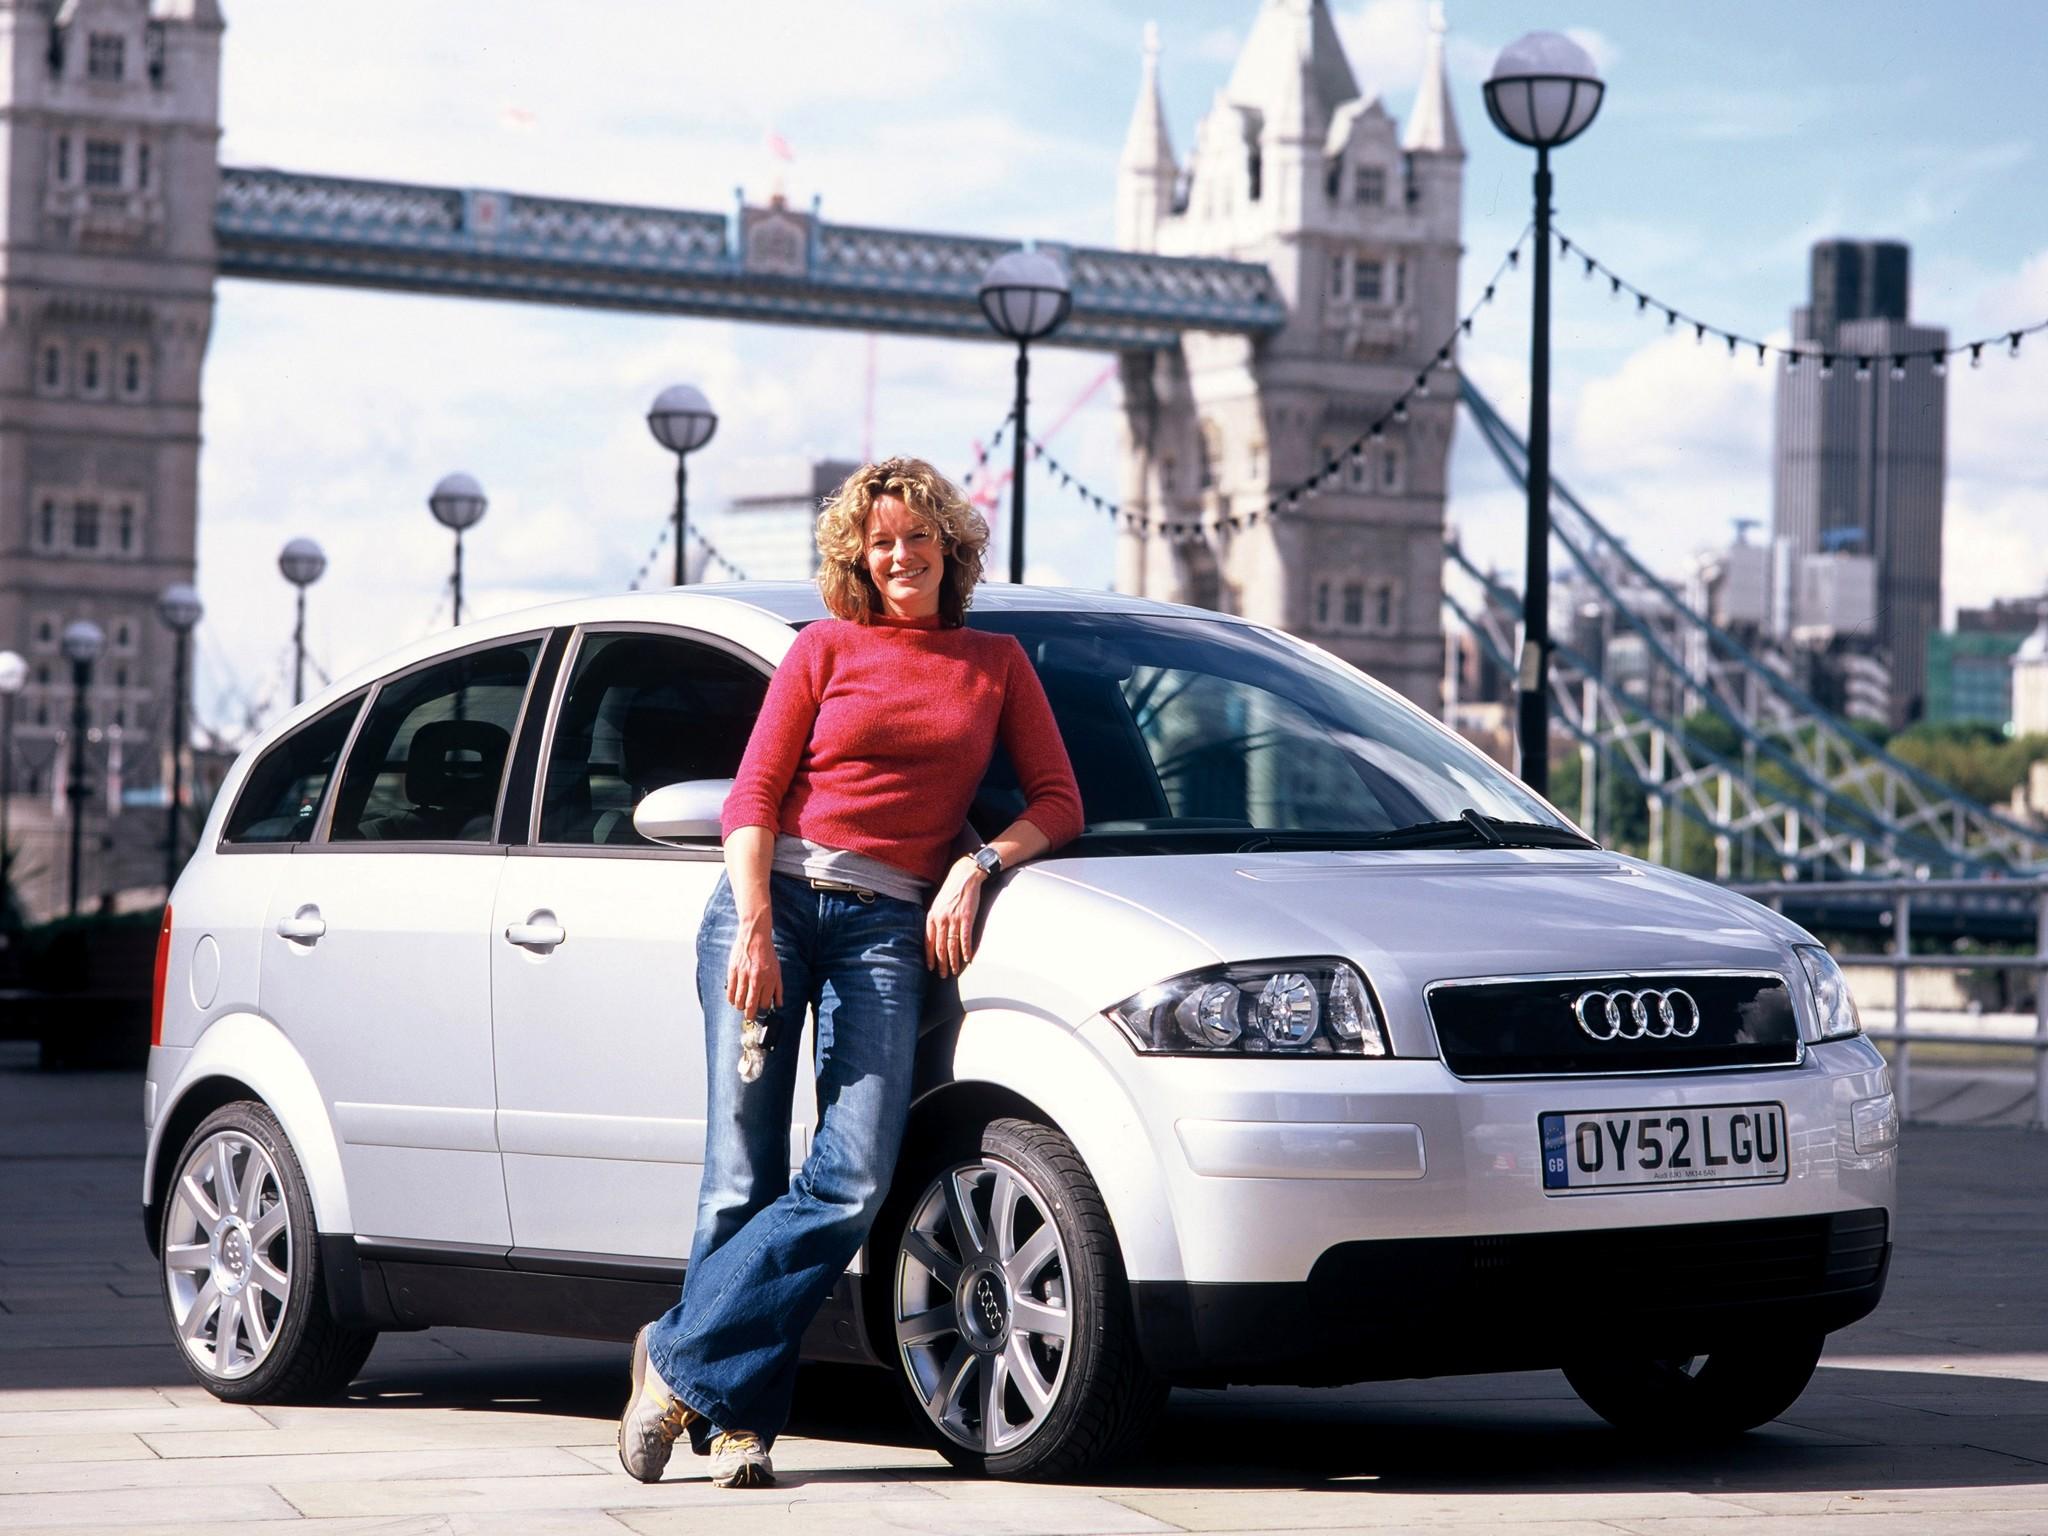 Kelebihan Kekurangan Audi A2 2002 Murah Berkualitas